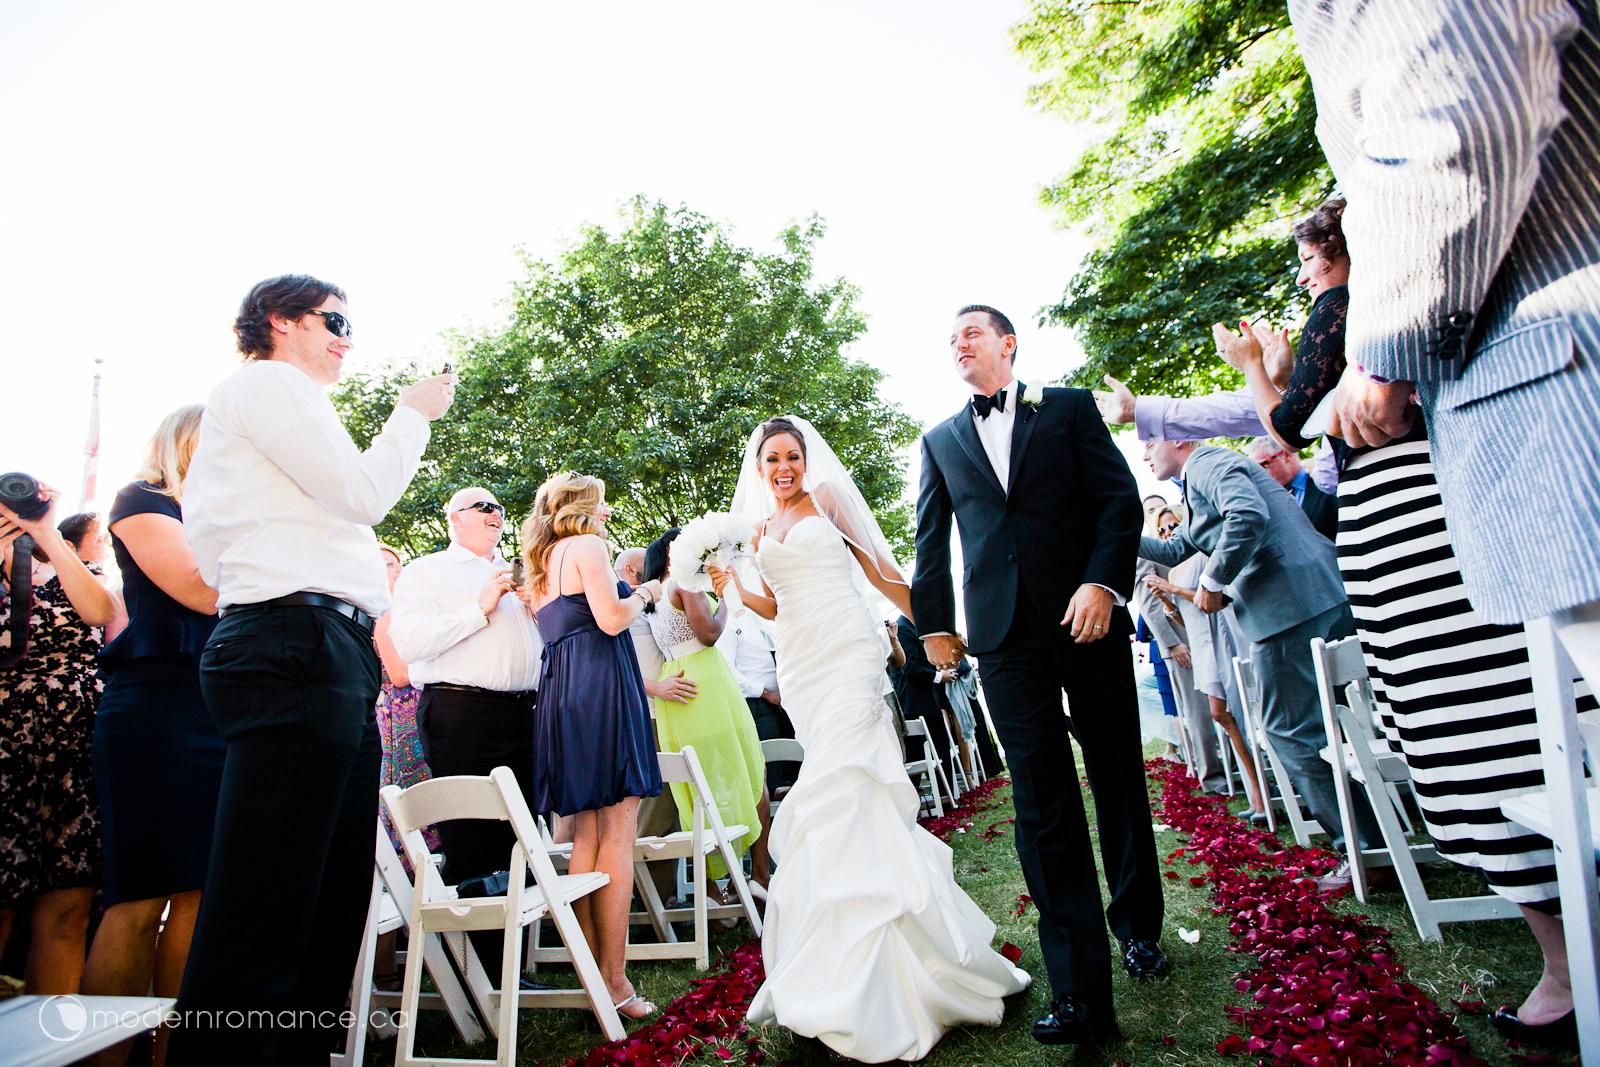 Modern_Romance_BM_Wedding-6935.jpg